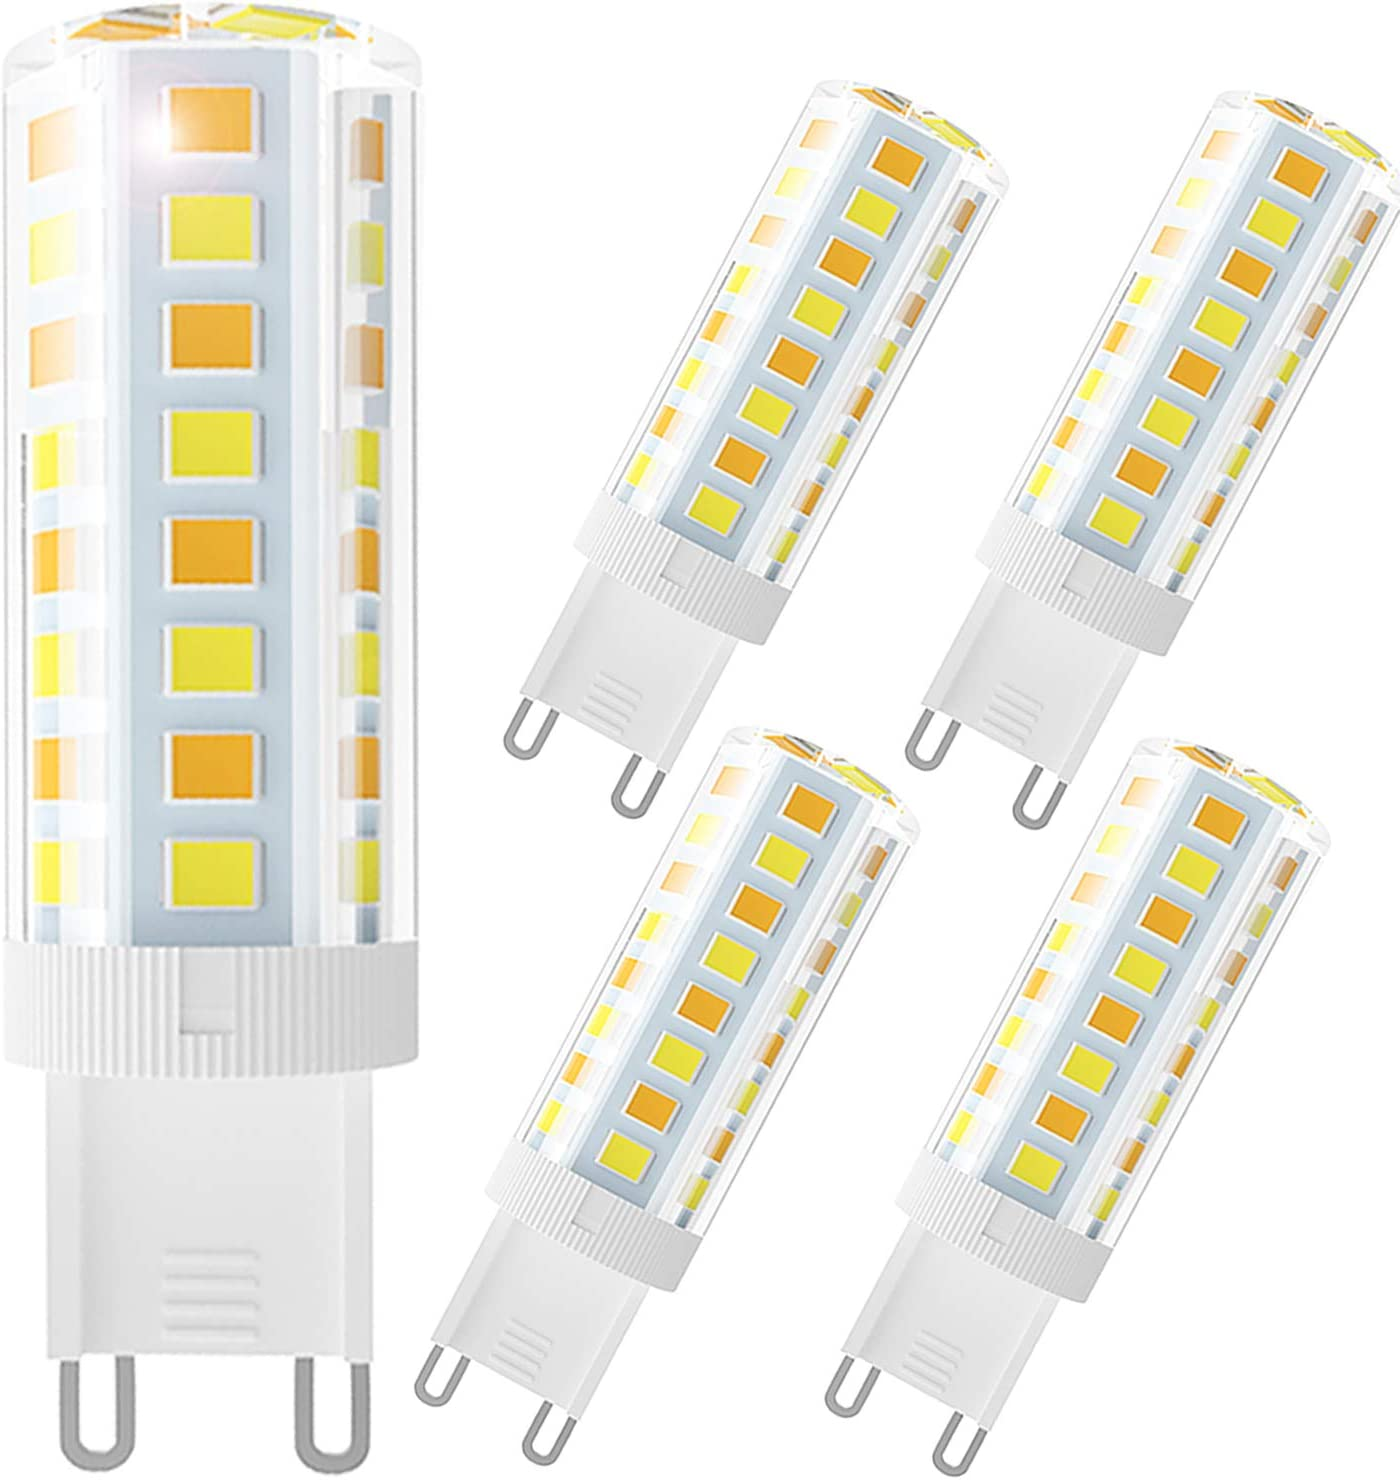 6000K 4000K 3000K Pendant Light 120V 5-Pack Wavypo G9 LED Bulb with 3-Color-Temperature 4W Equivalent 40W Halogen Lamp G9 Base for Chandelier Change Daylight// Neutral Light// Warm Light